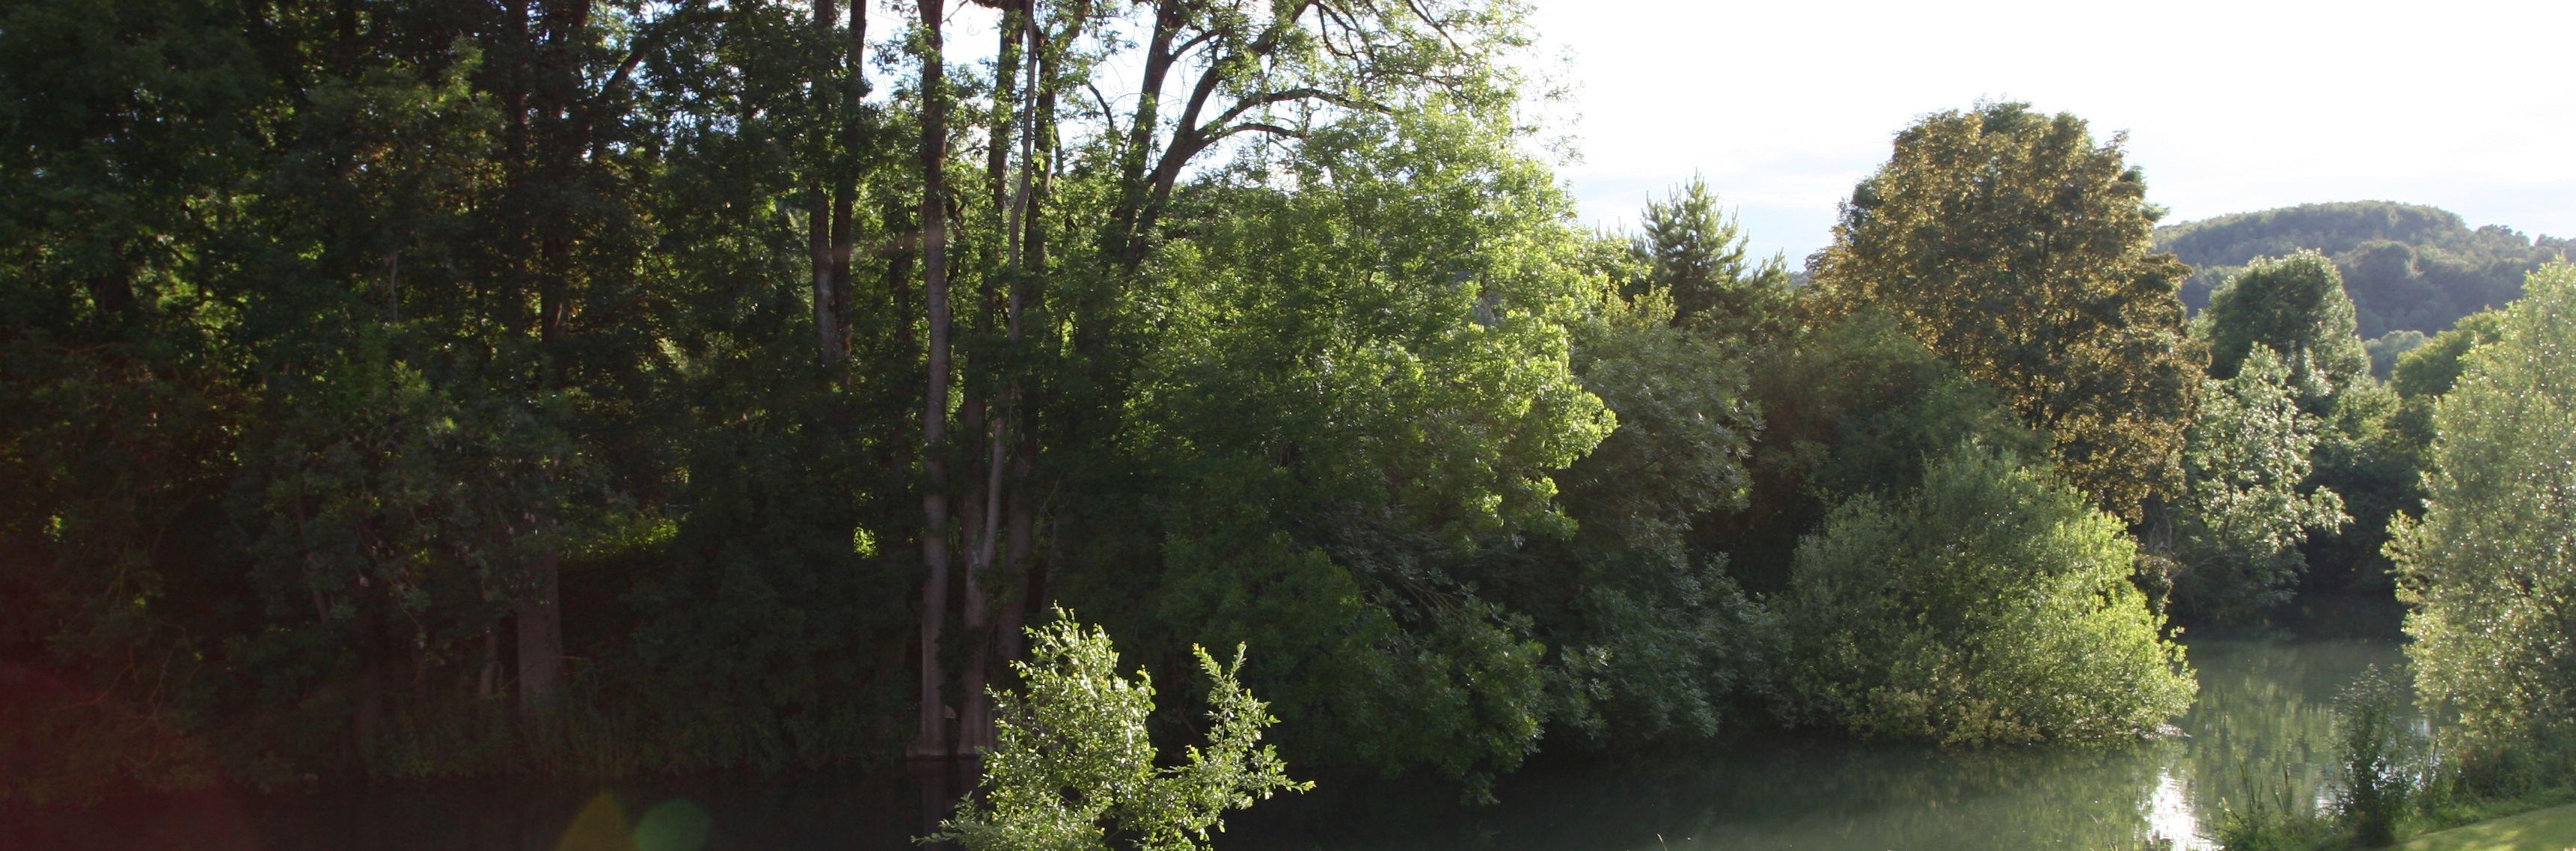 blaublick-panoramafoto